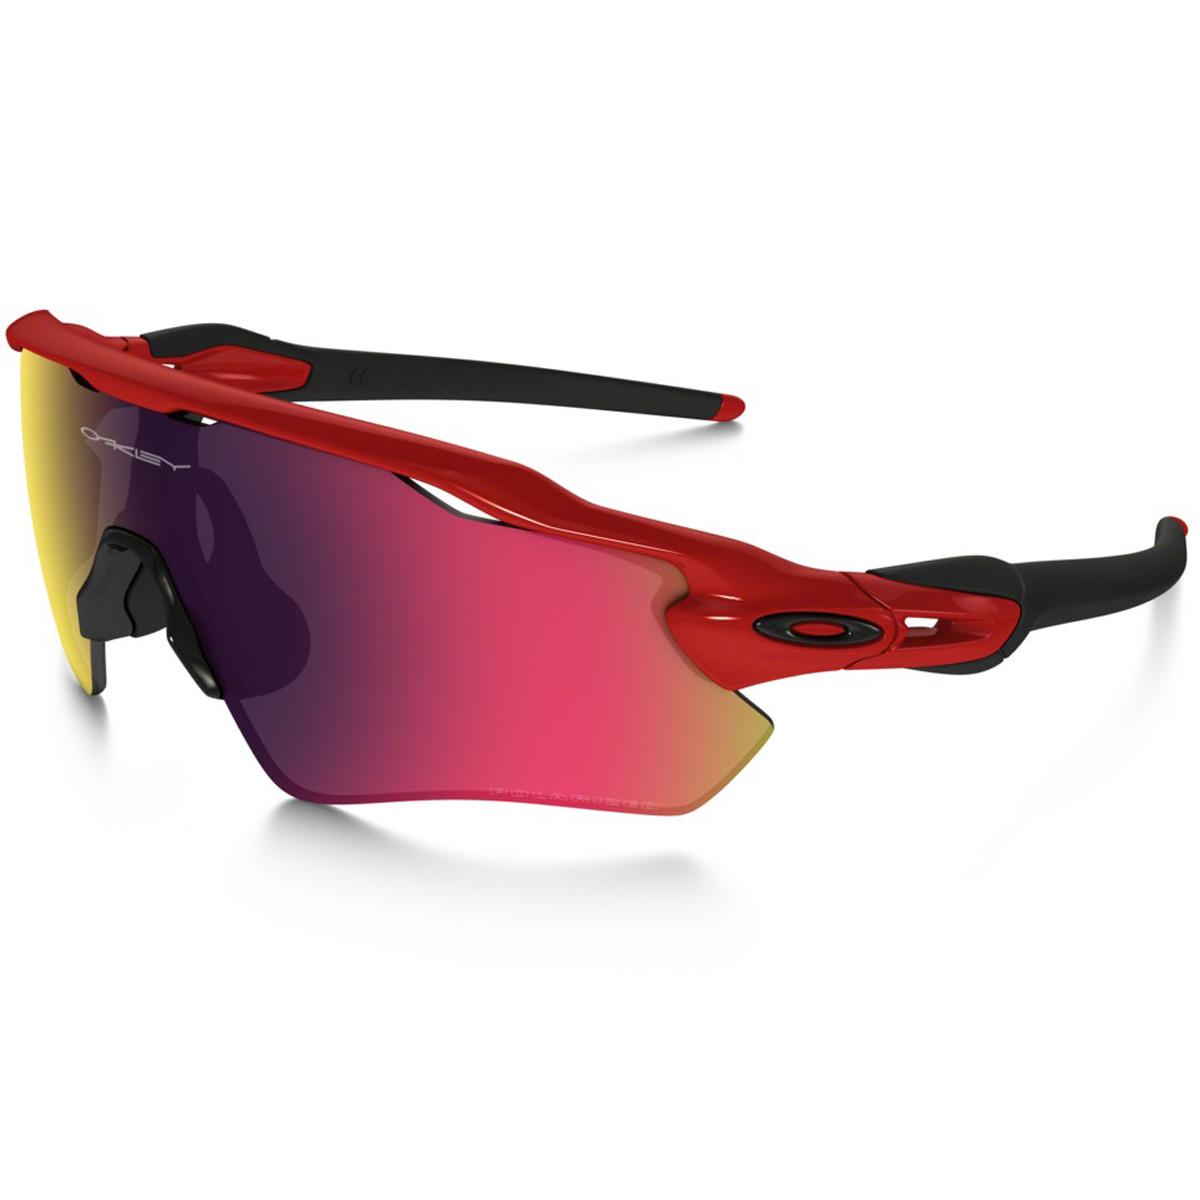 Óculos Oakley Radarlock EV Red iridium Lente Red Line Polarizado ref ... bf63c84f44